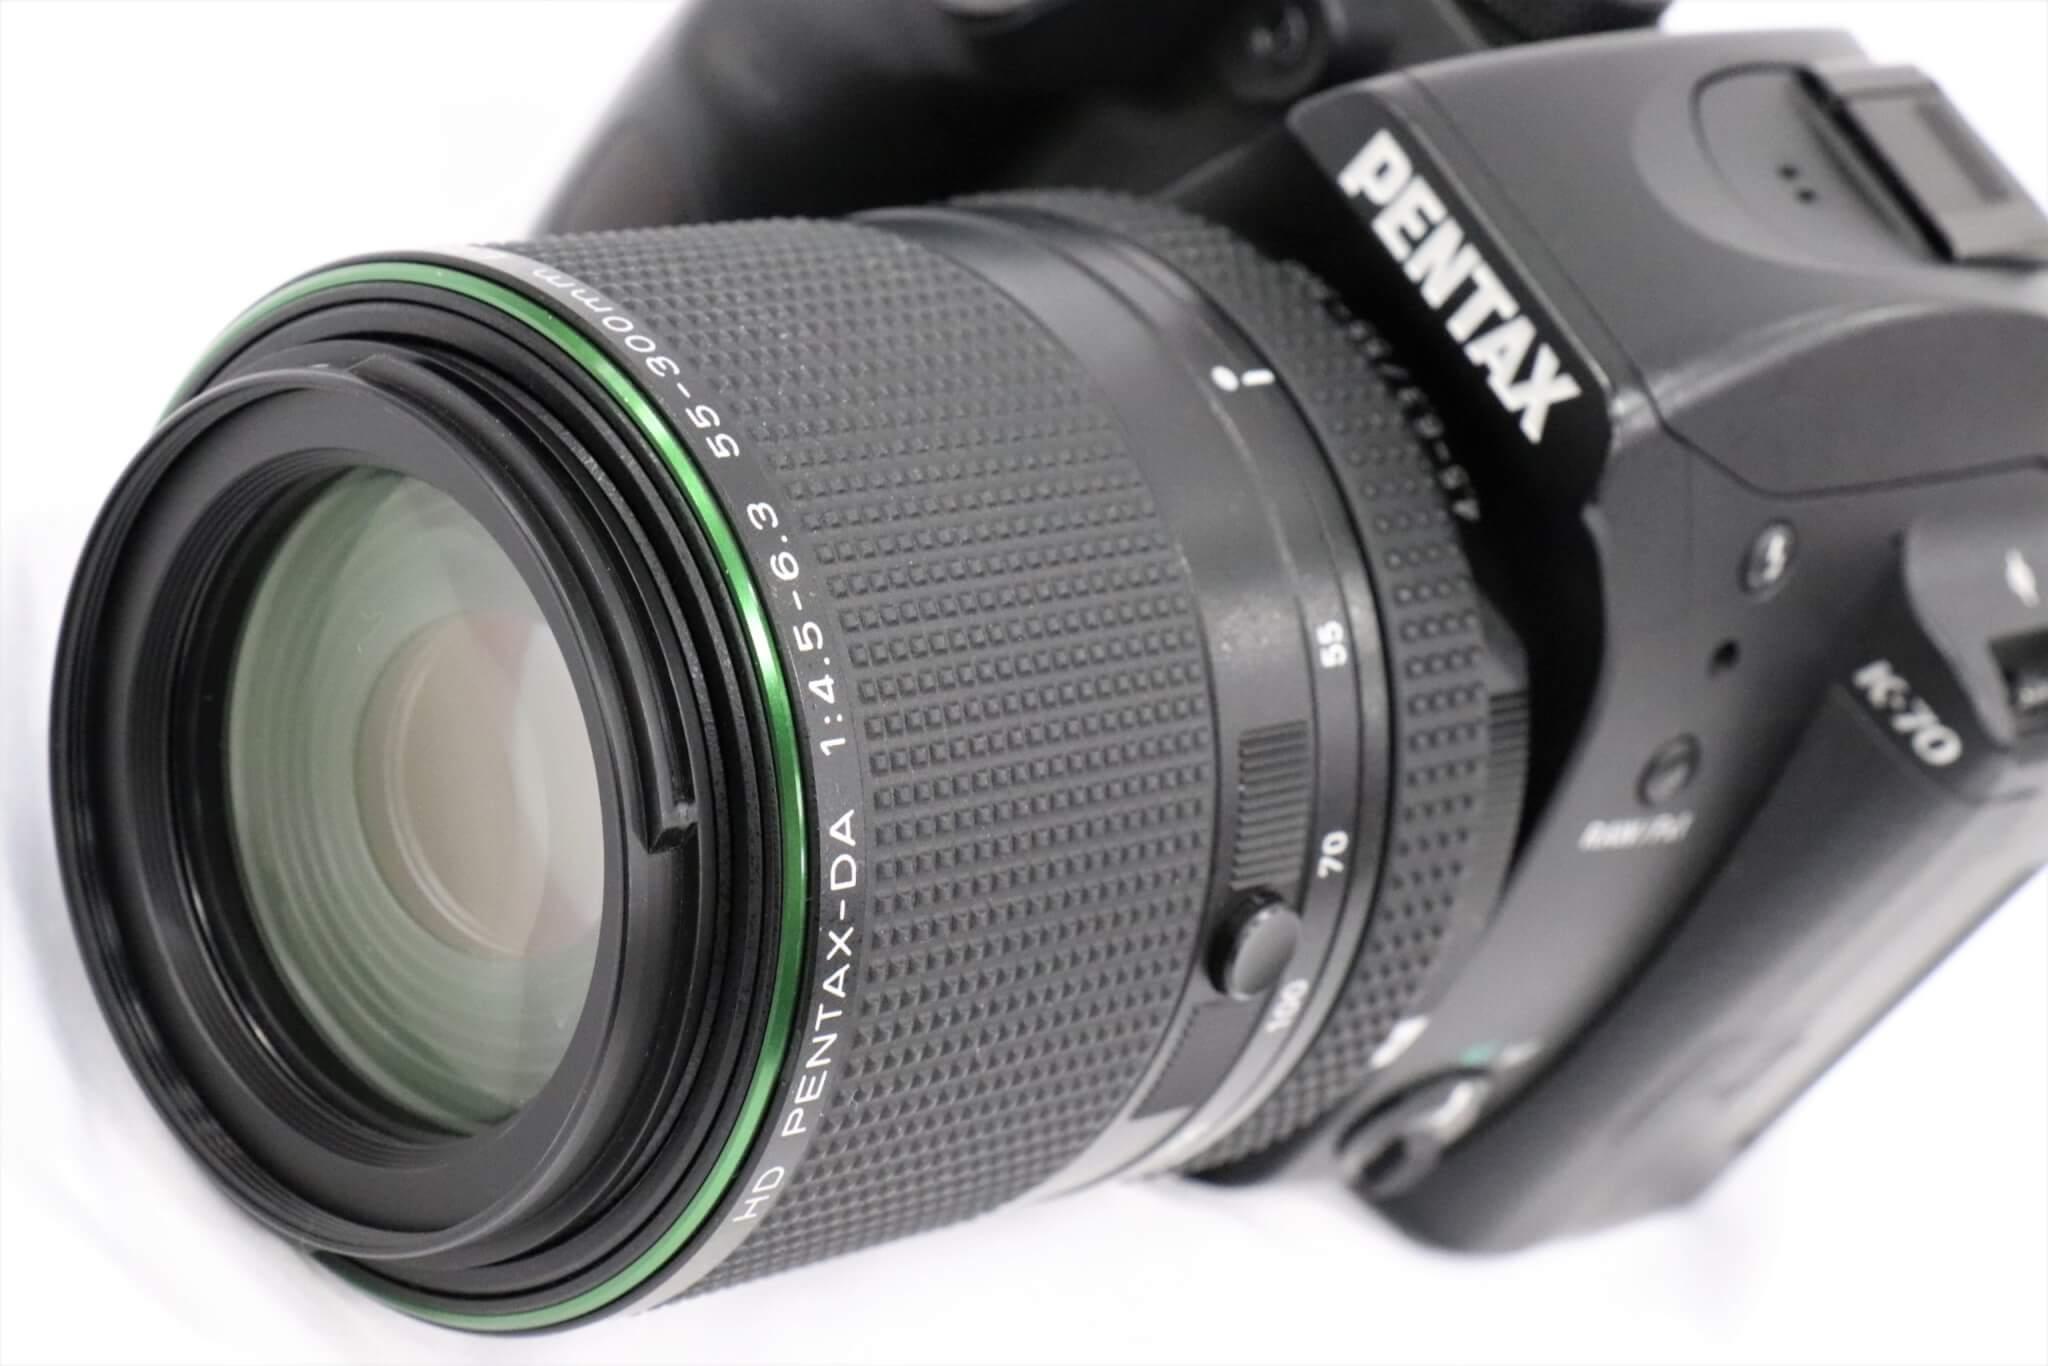 HD PENTAX-DA 55-300mmF4.5-6.3ED PLM WR RE実写レビュー。静音・高速AFを可能にした望遠ズームレンズ